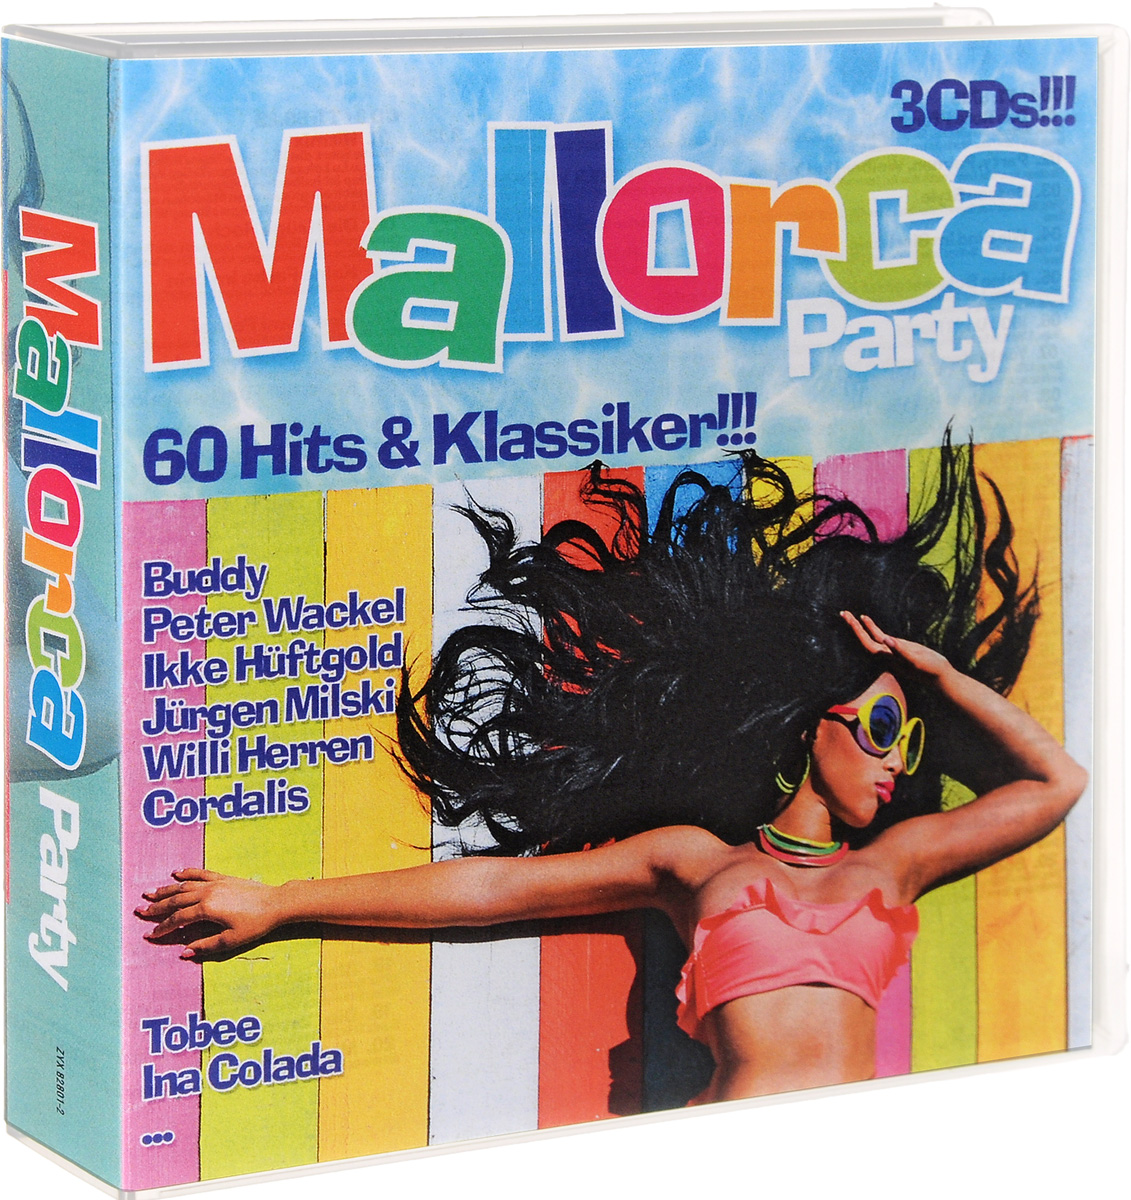 Mallorca Party. 60 Hits & Klassiker!!! (3 CD) public viewing party hits 2 cd